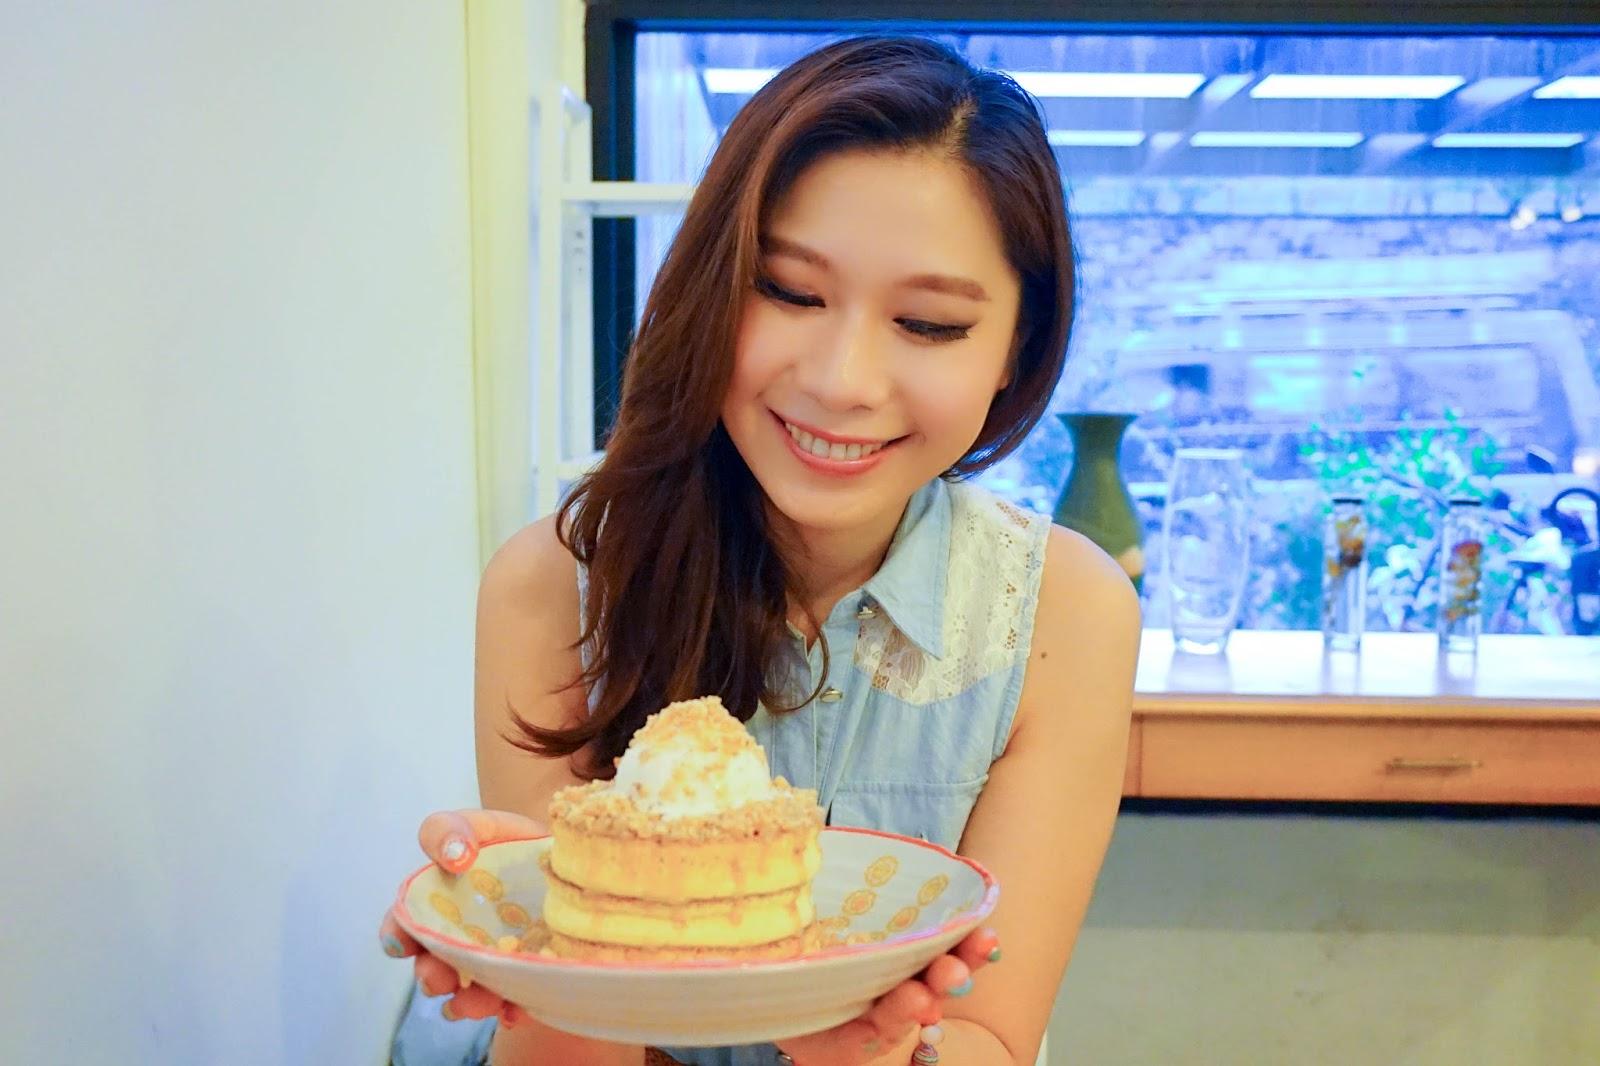 21-hualien-travel-woodstock-pancake-IMG_3711-beautyanxiety.com-hualien-desserts-woodstock-pancake